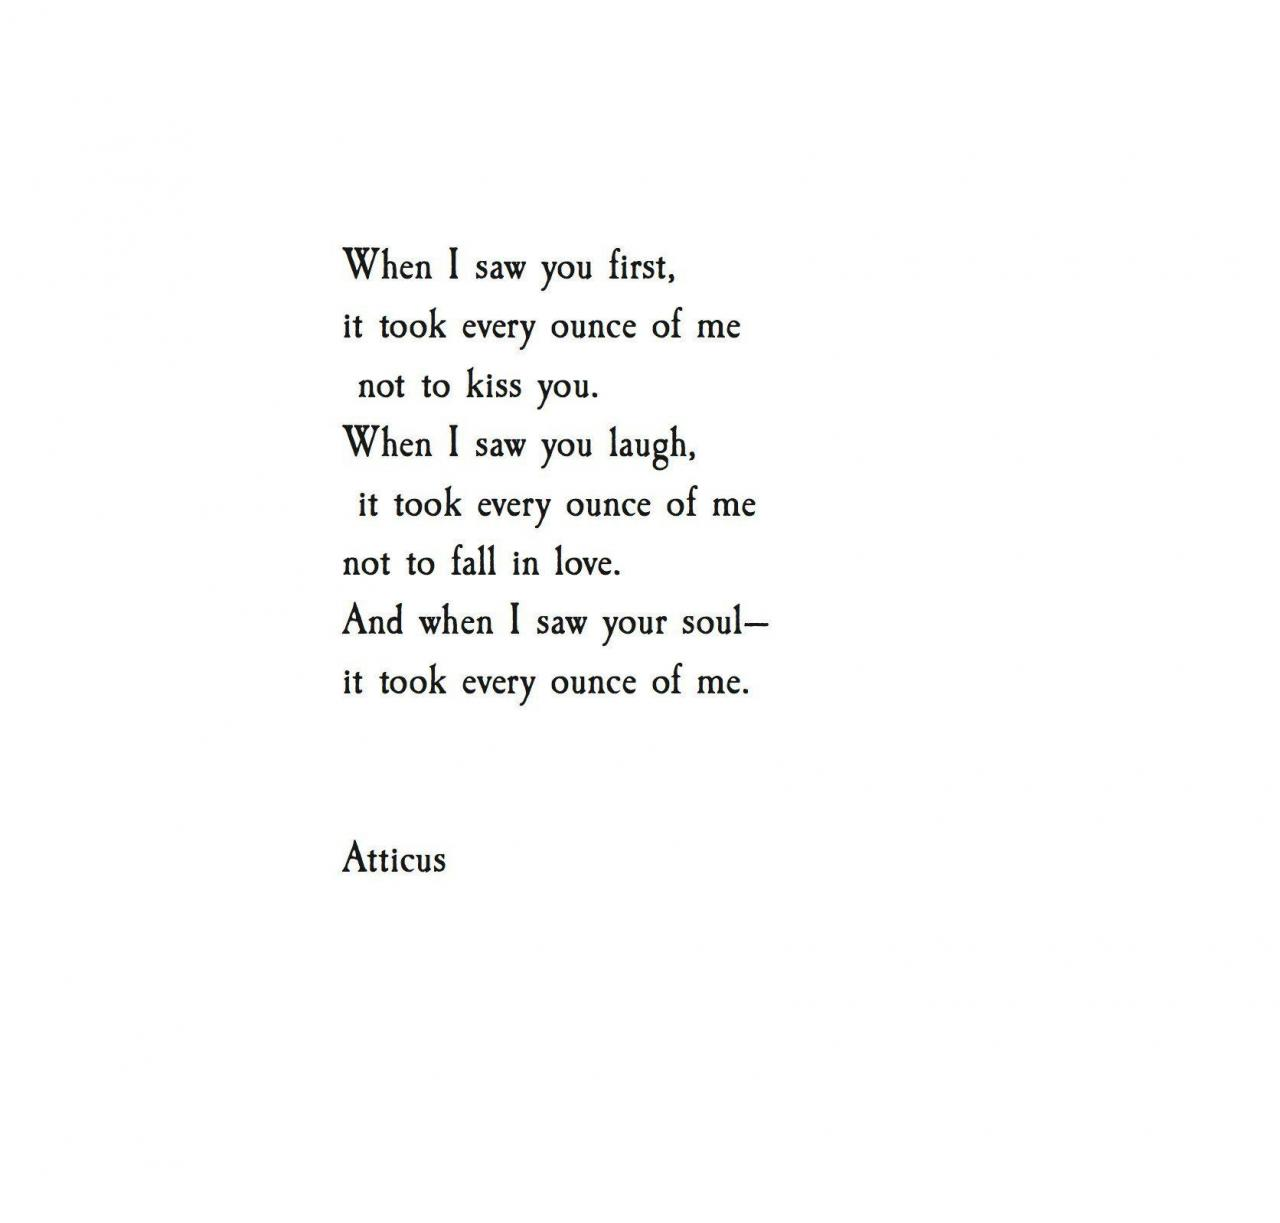 Atticus Poetry On Twitter  Quotespoem Quoteswise Quotesnew Love Quotessweet